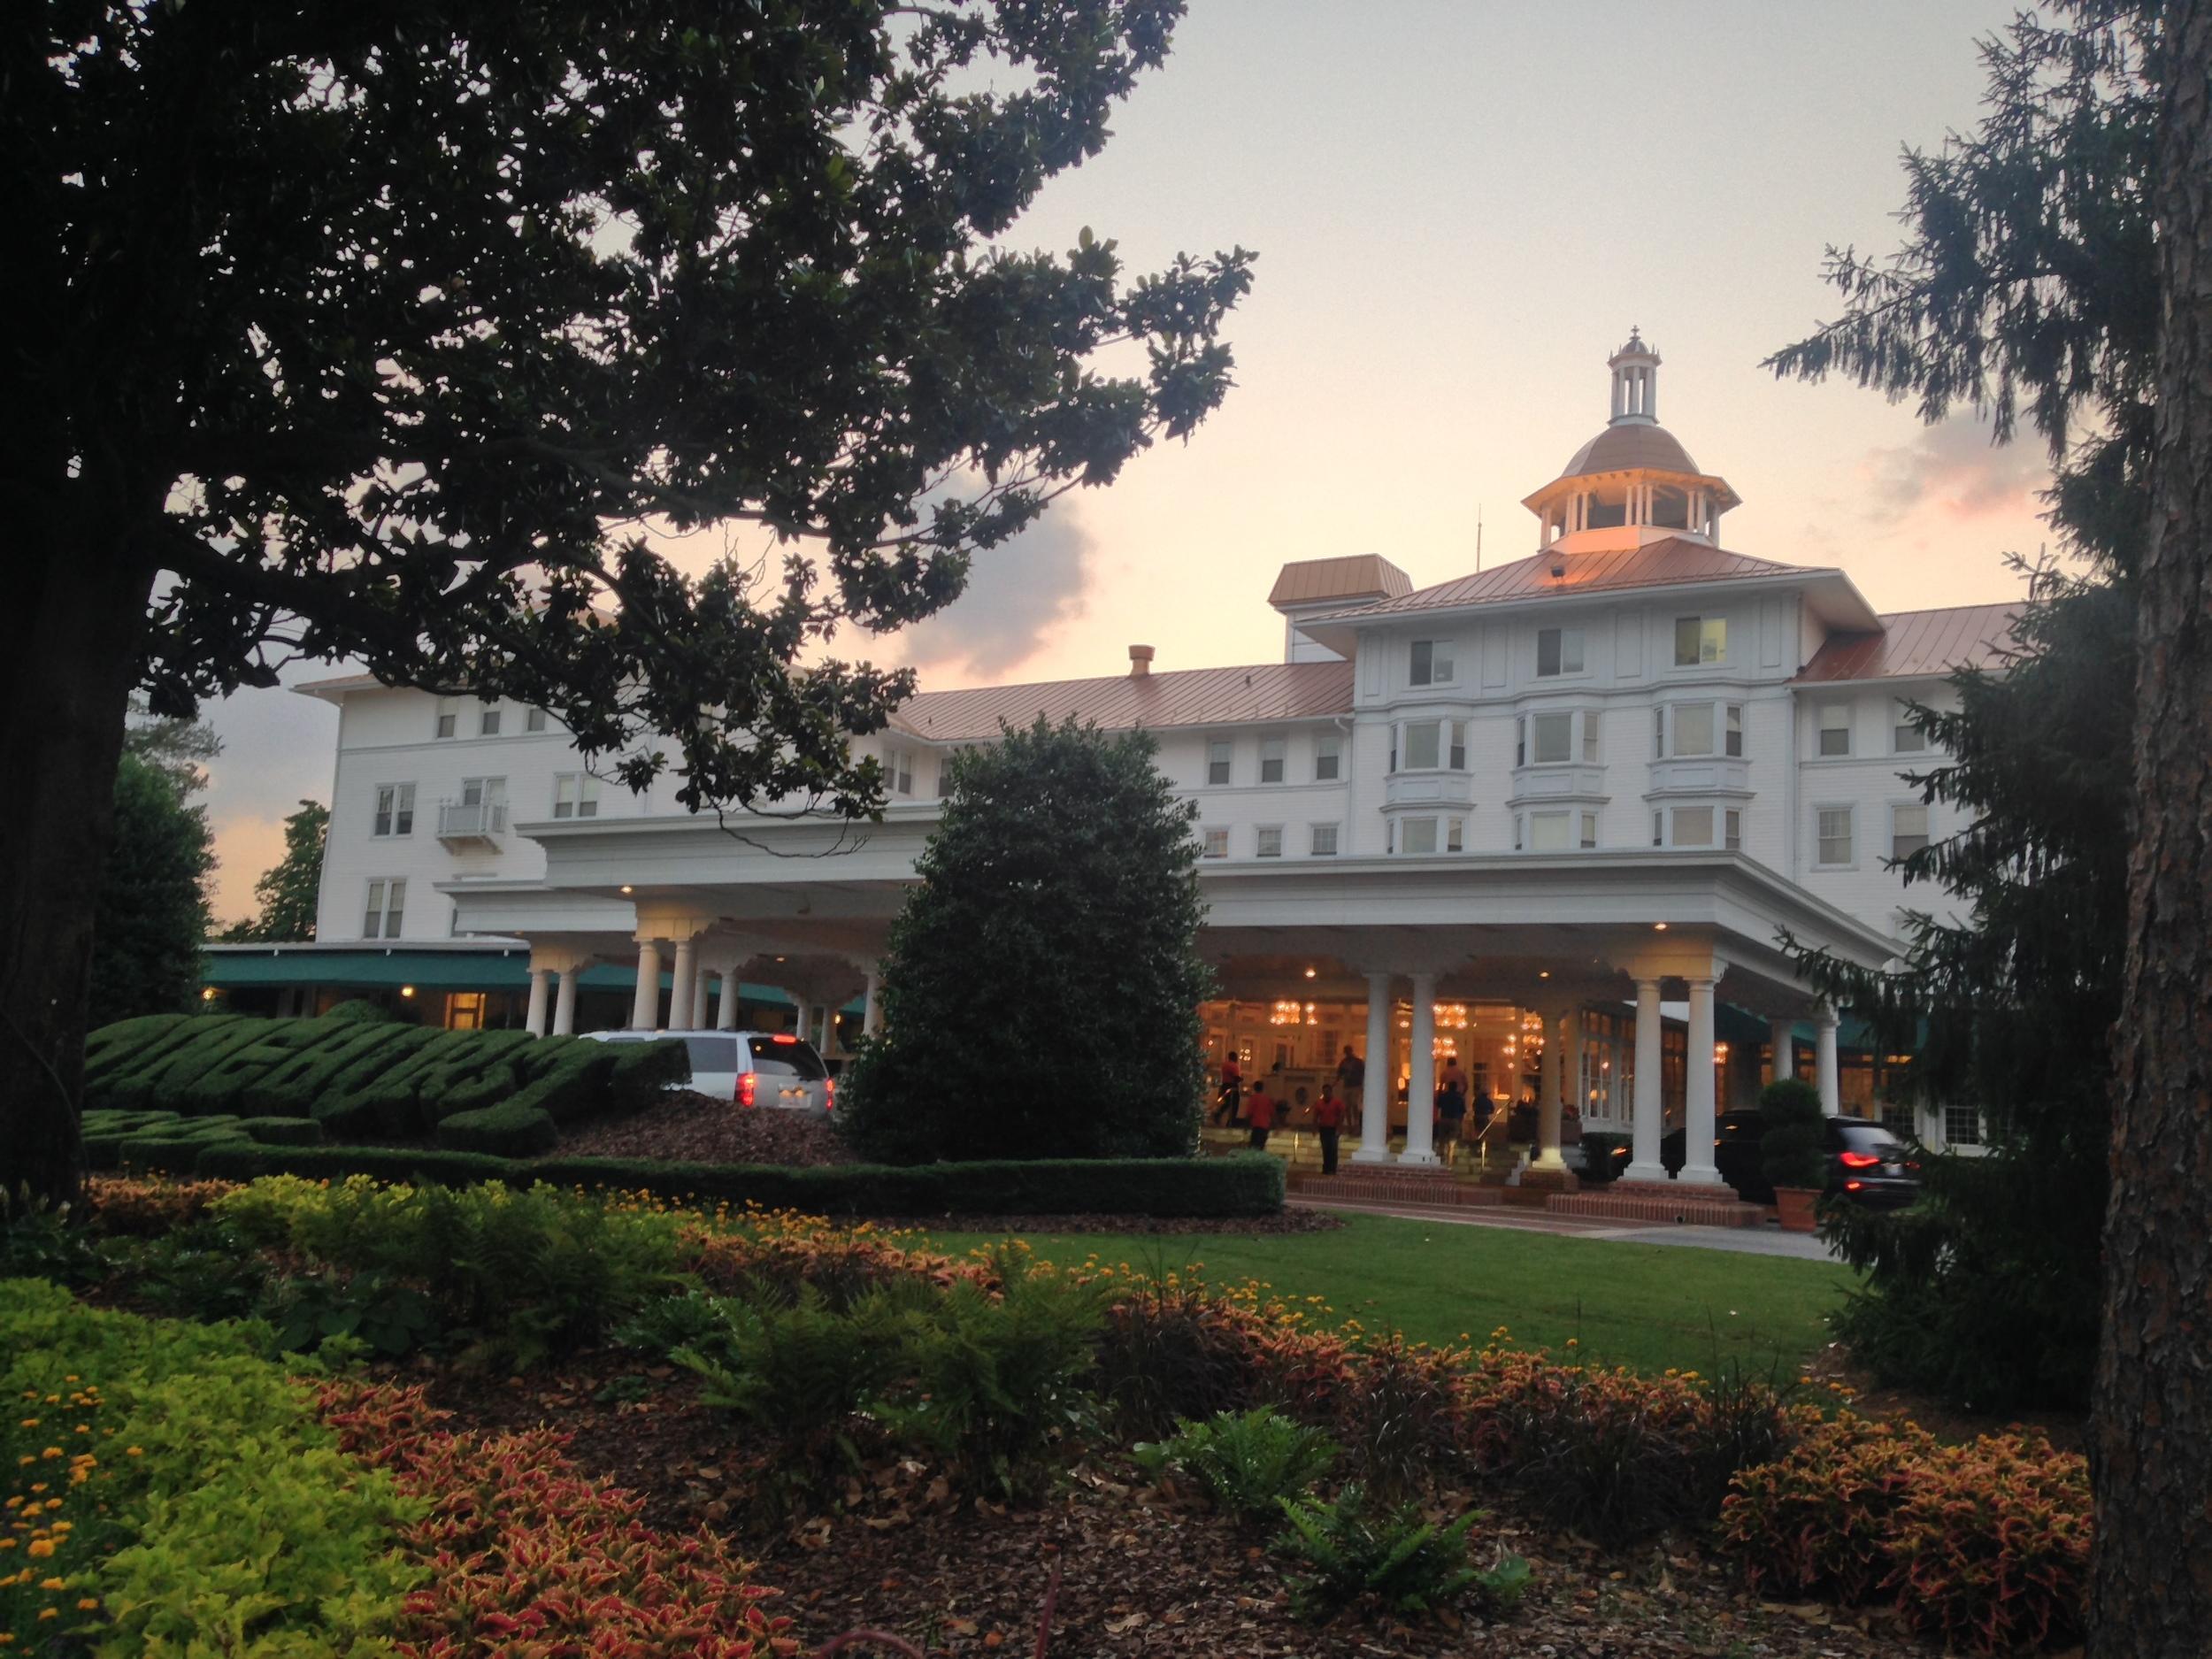 { The Carolina Hotel at dusk }